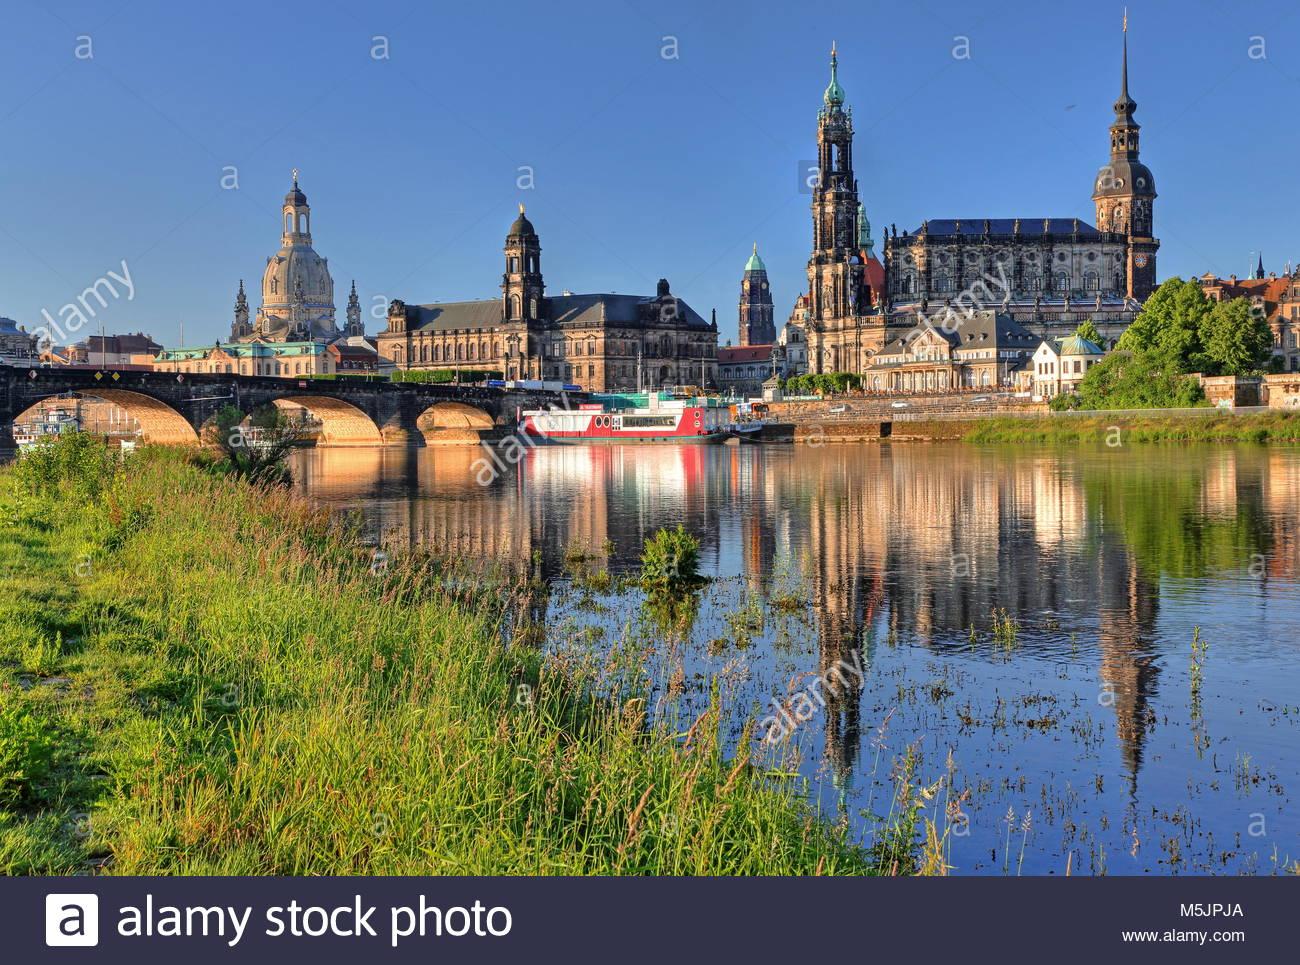 Elbe river with Augustusbrücke,Frauenkirche,Higher Regional Court,Hofkirche and Schlossturm,Old Town,Dresden,Saxony - Stock Image